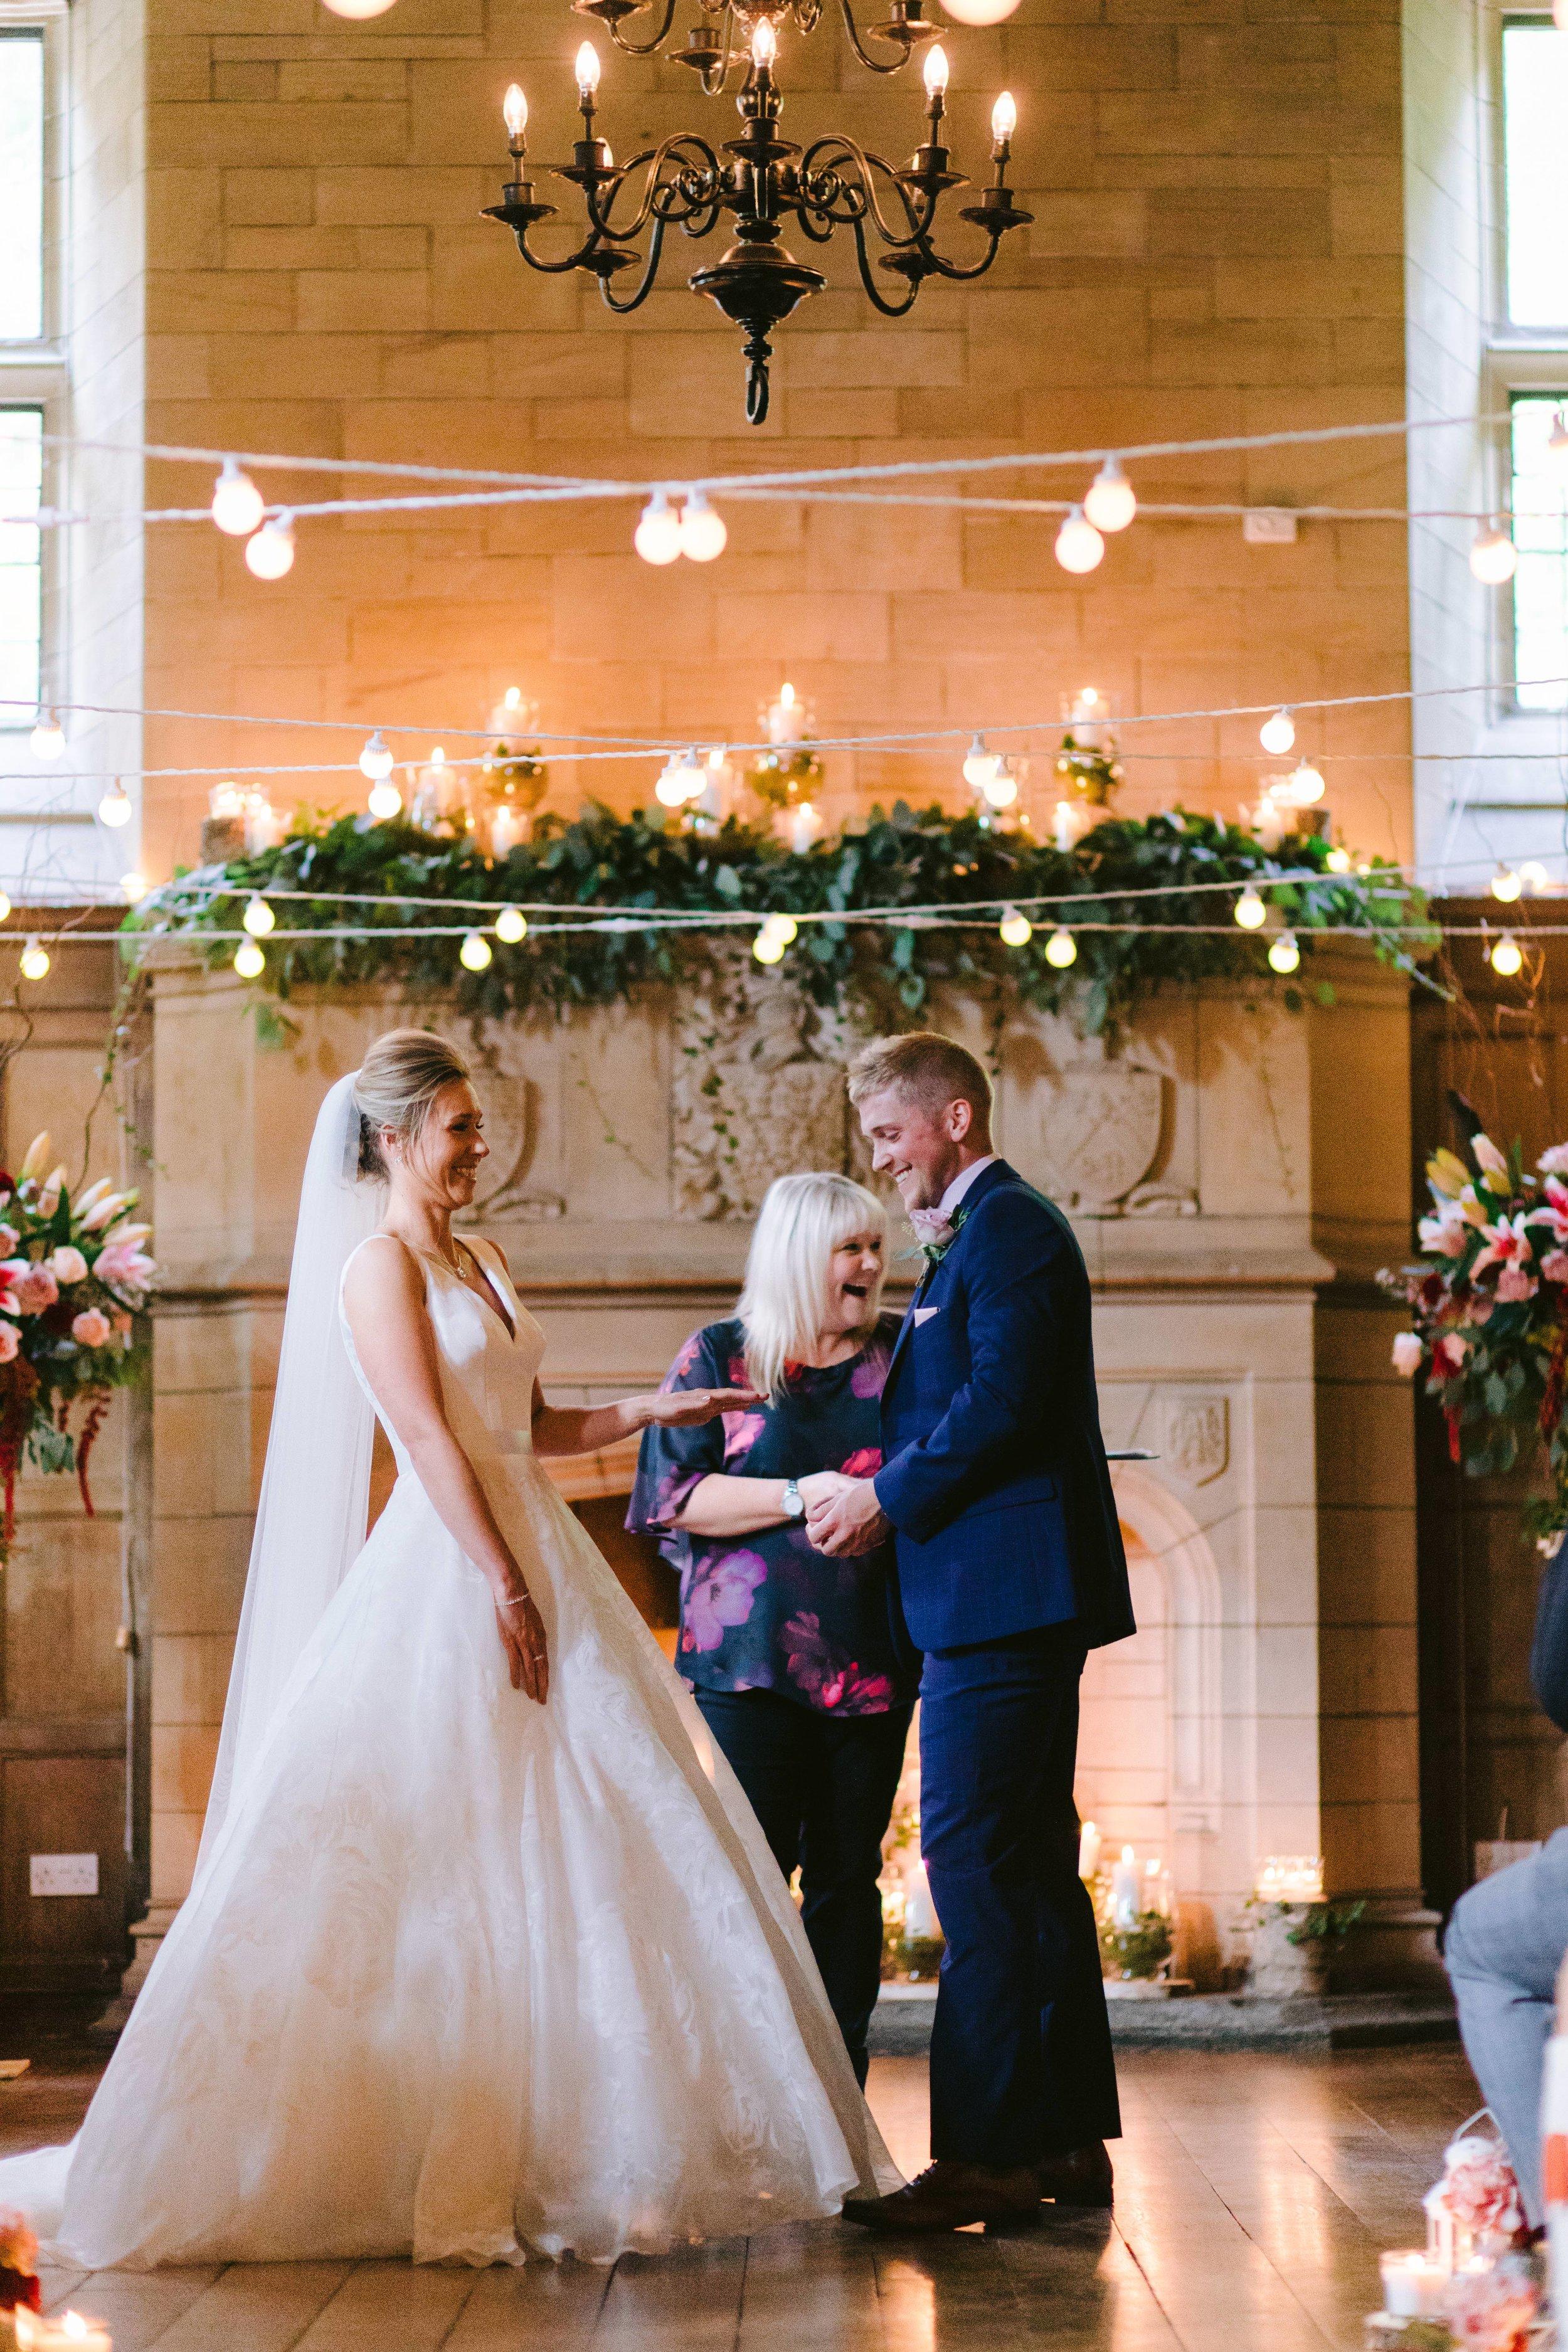 Karin_and_Shauns_Wedding_-_Achnagairn_Castle_-_www.eilidhrobertson.co.uk-476.jpg